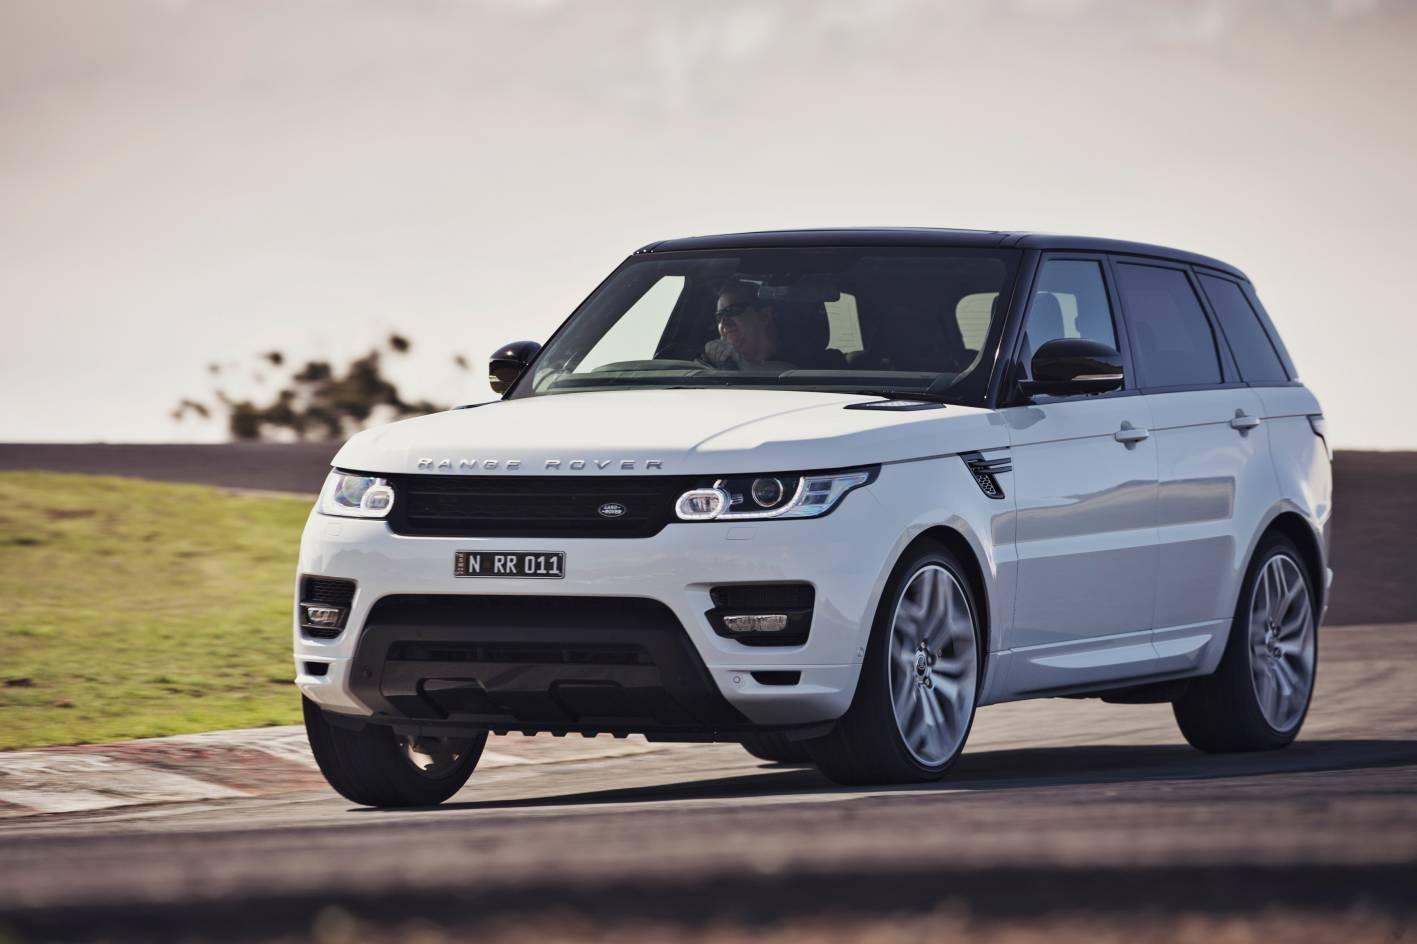 australian vehicle sales for february 2014 land rover shines performancedrive. Black Bedroom Furniture Sets. Home Design Ideas